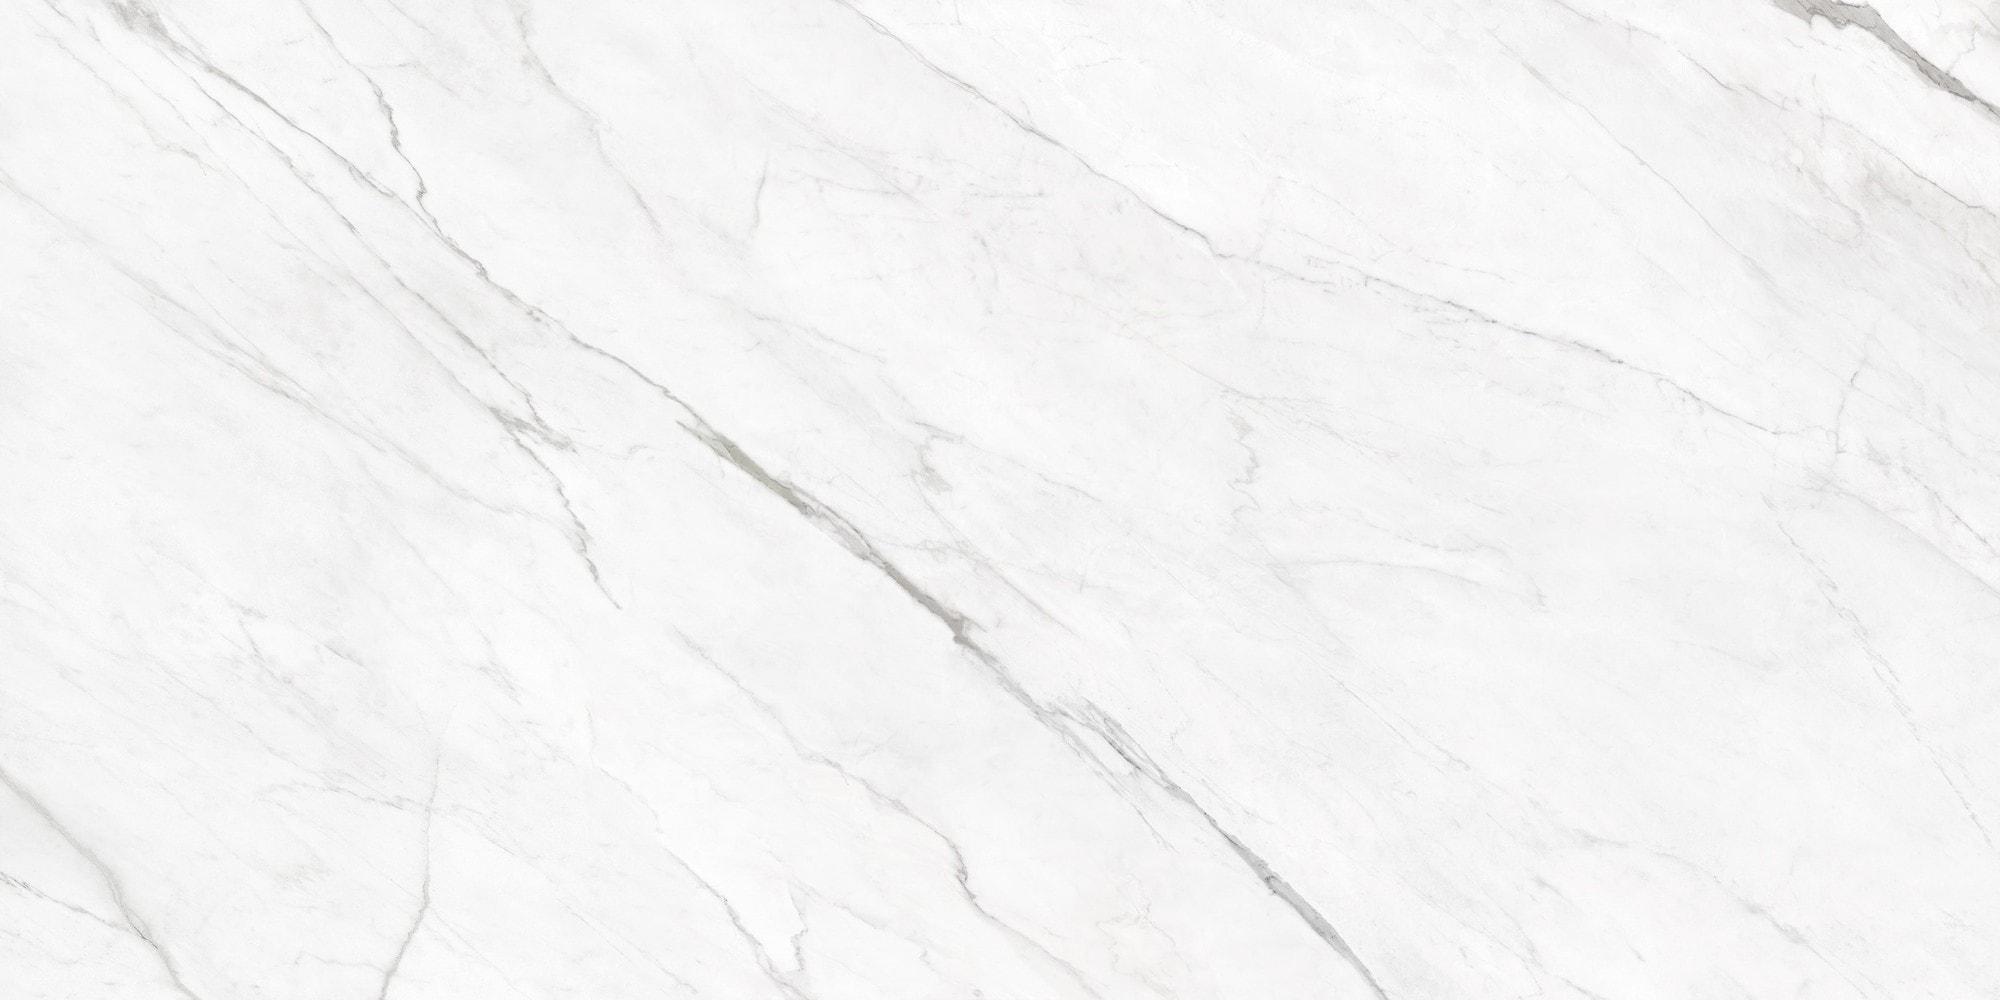 Płytka podłogowa Ultime Cerrad Statuario white poler 162x324cm 43896 @